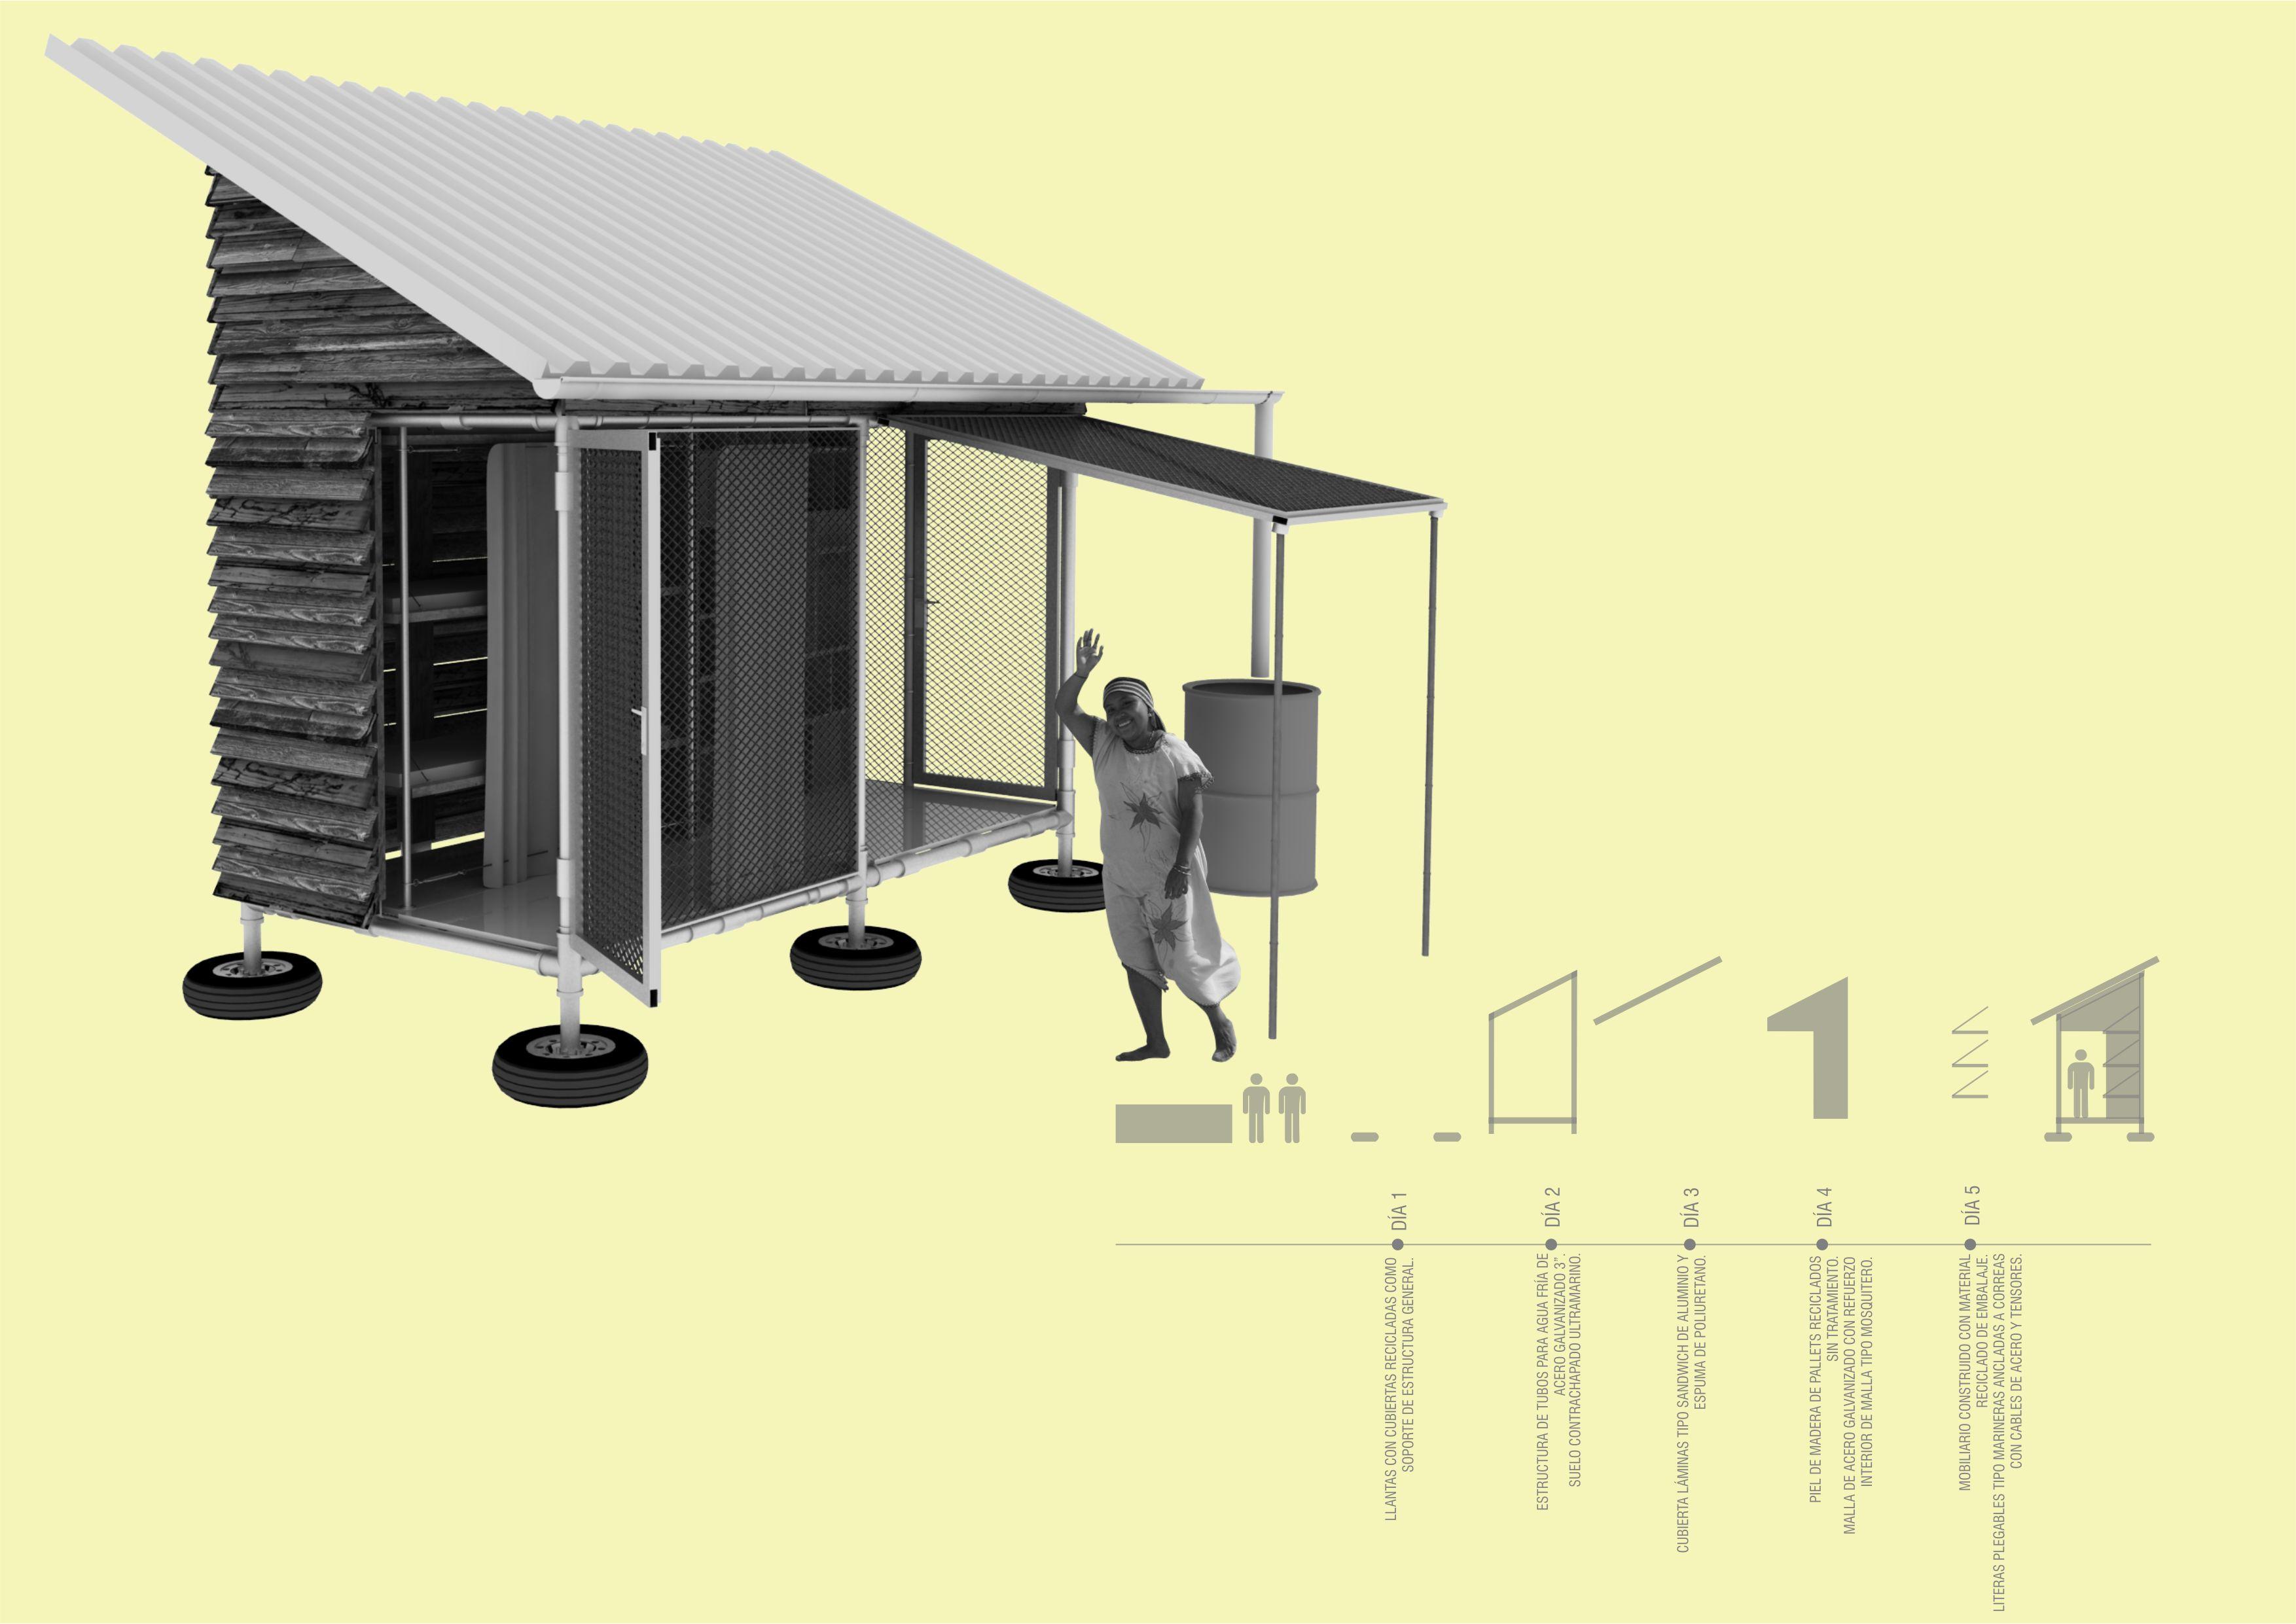 H bitat mim tico vivienda de emergencia ecosistema urbano for Espacios minimos arquitectura